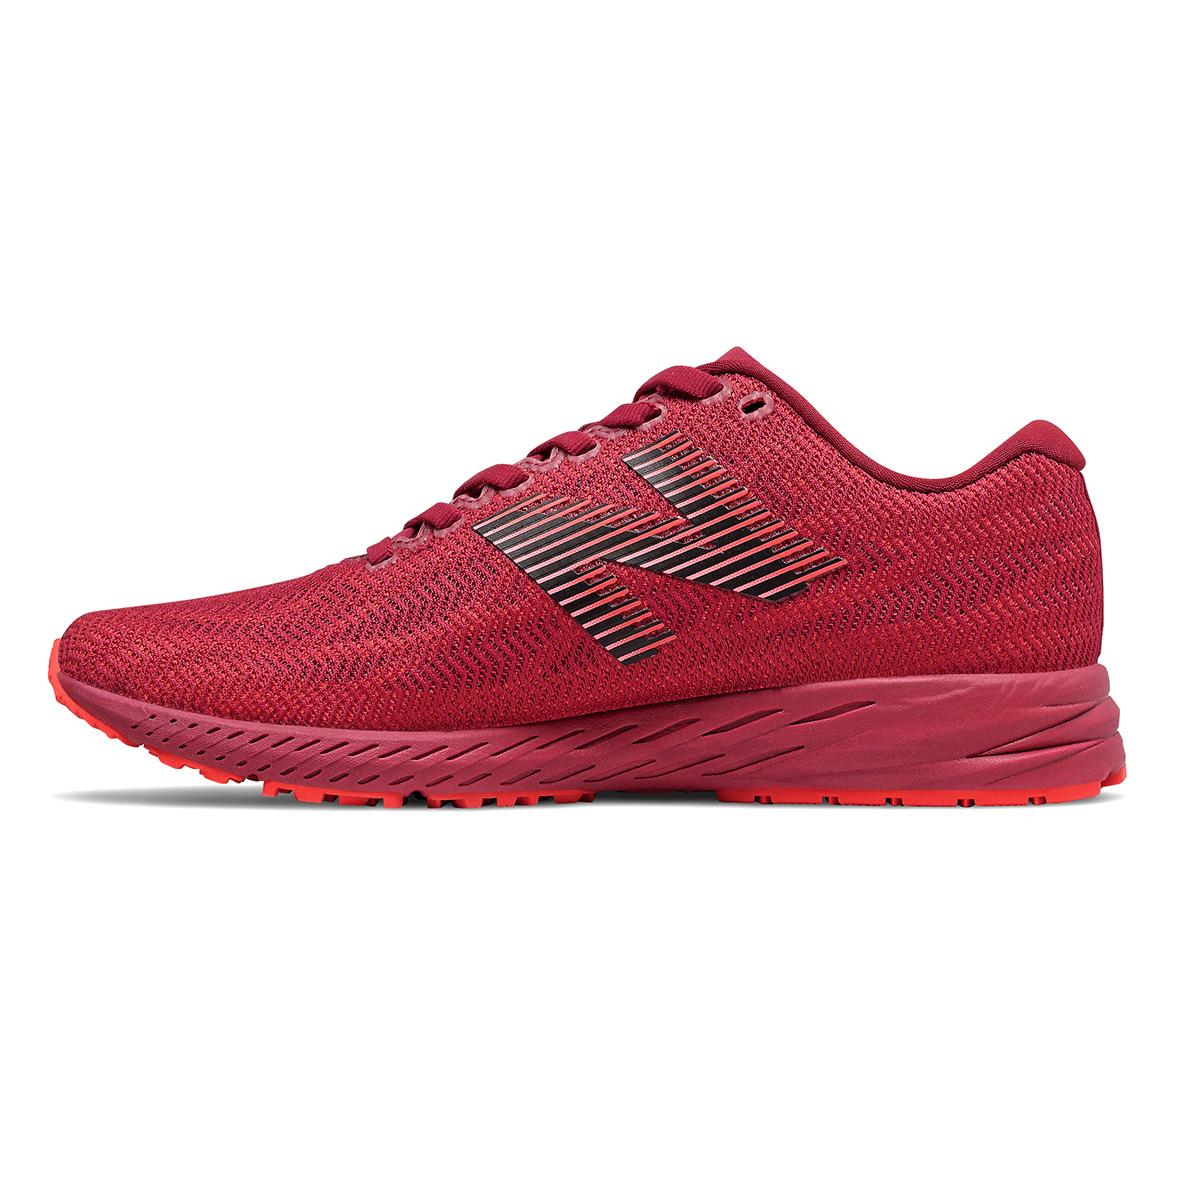 Women's New Balance 1400V6 Running Shoe - Color: Neo Crimson - Size: 5 - Width: Regular, Neo Crimson, large, image 4